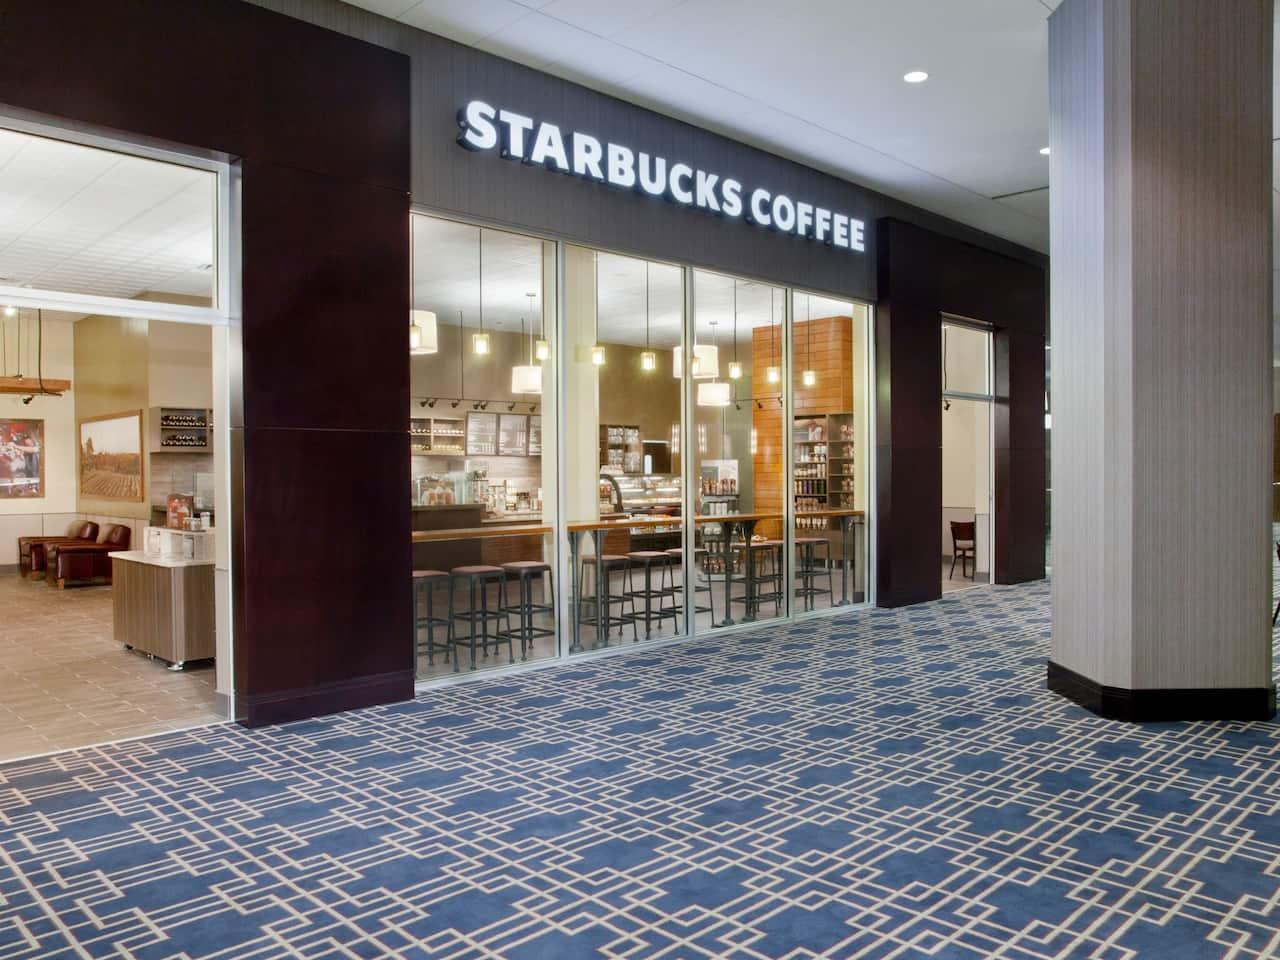 Starbucks exterior at Hyatt Regency New Orleans